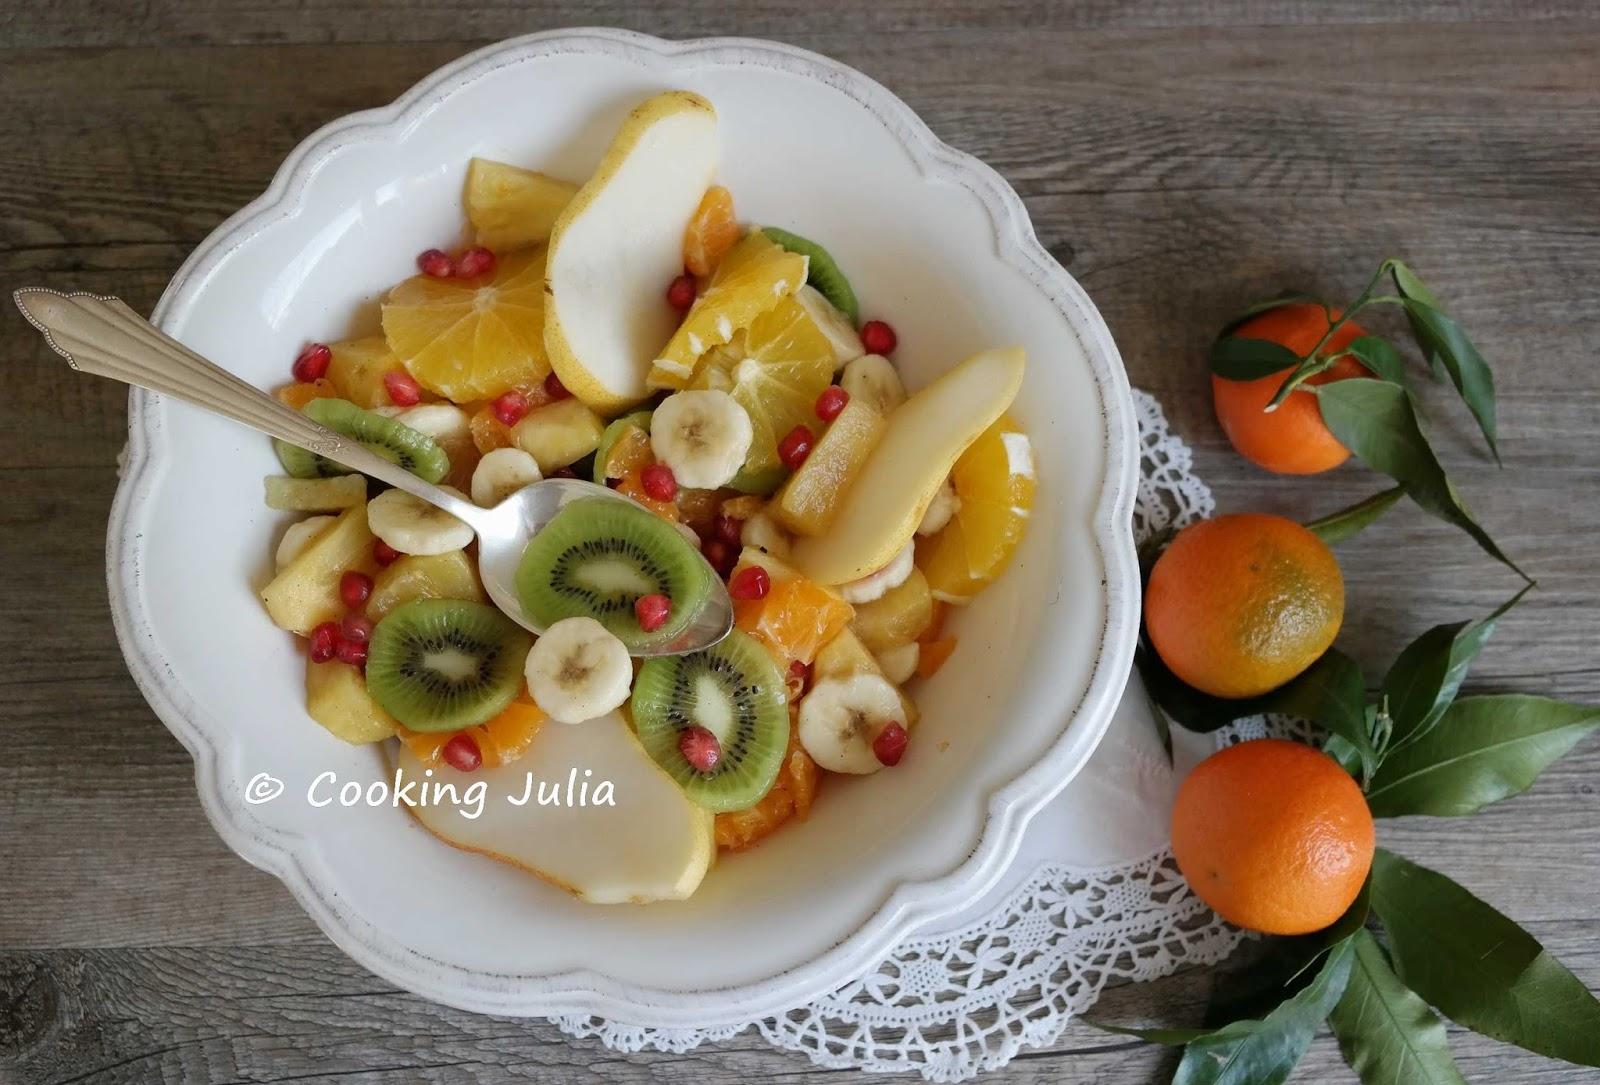 cooking julia salade de fruits d 39 hiver. Black Bedroom Furniture Sets. Home Design Ideas